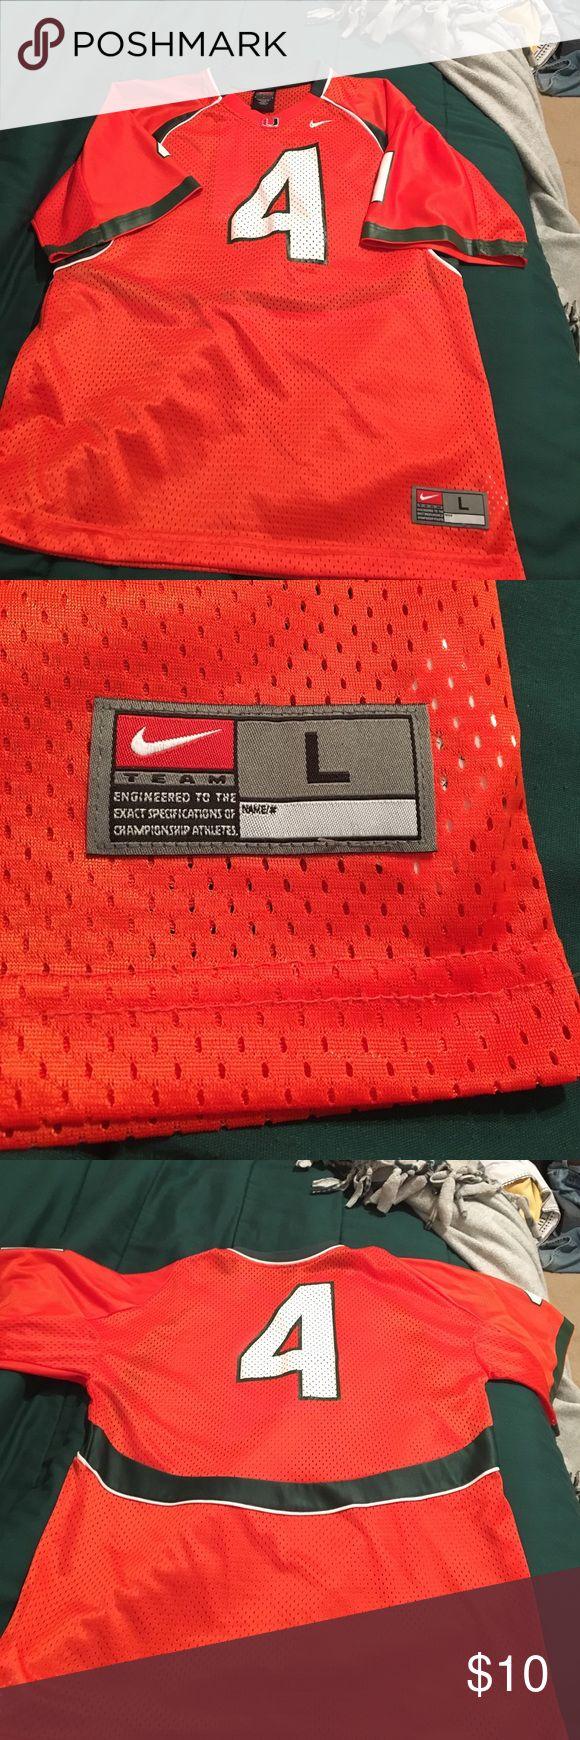 Miami Hurricanes football jerseys #4 Miami Hurricanes football jersey, in great condition, nice looking jersey. Nike Other